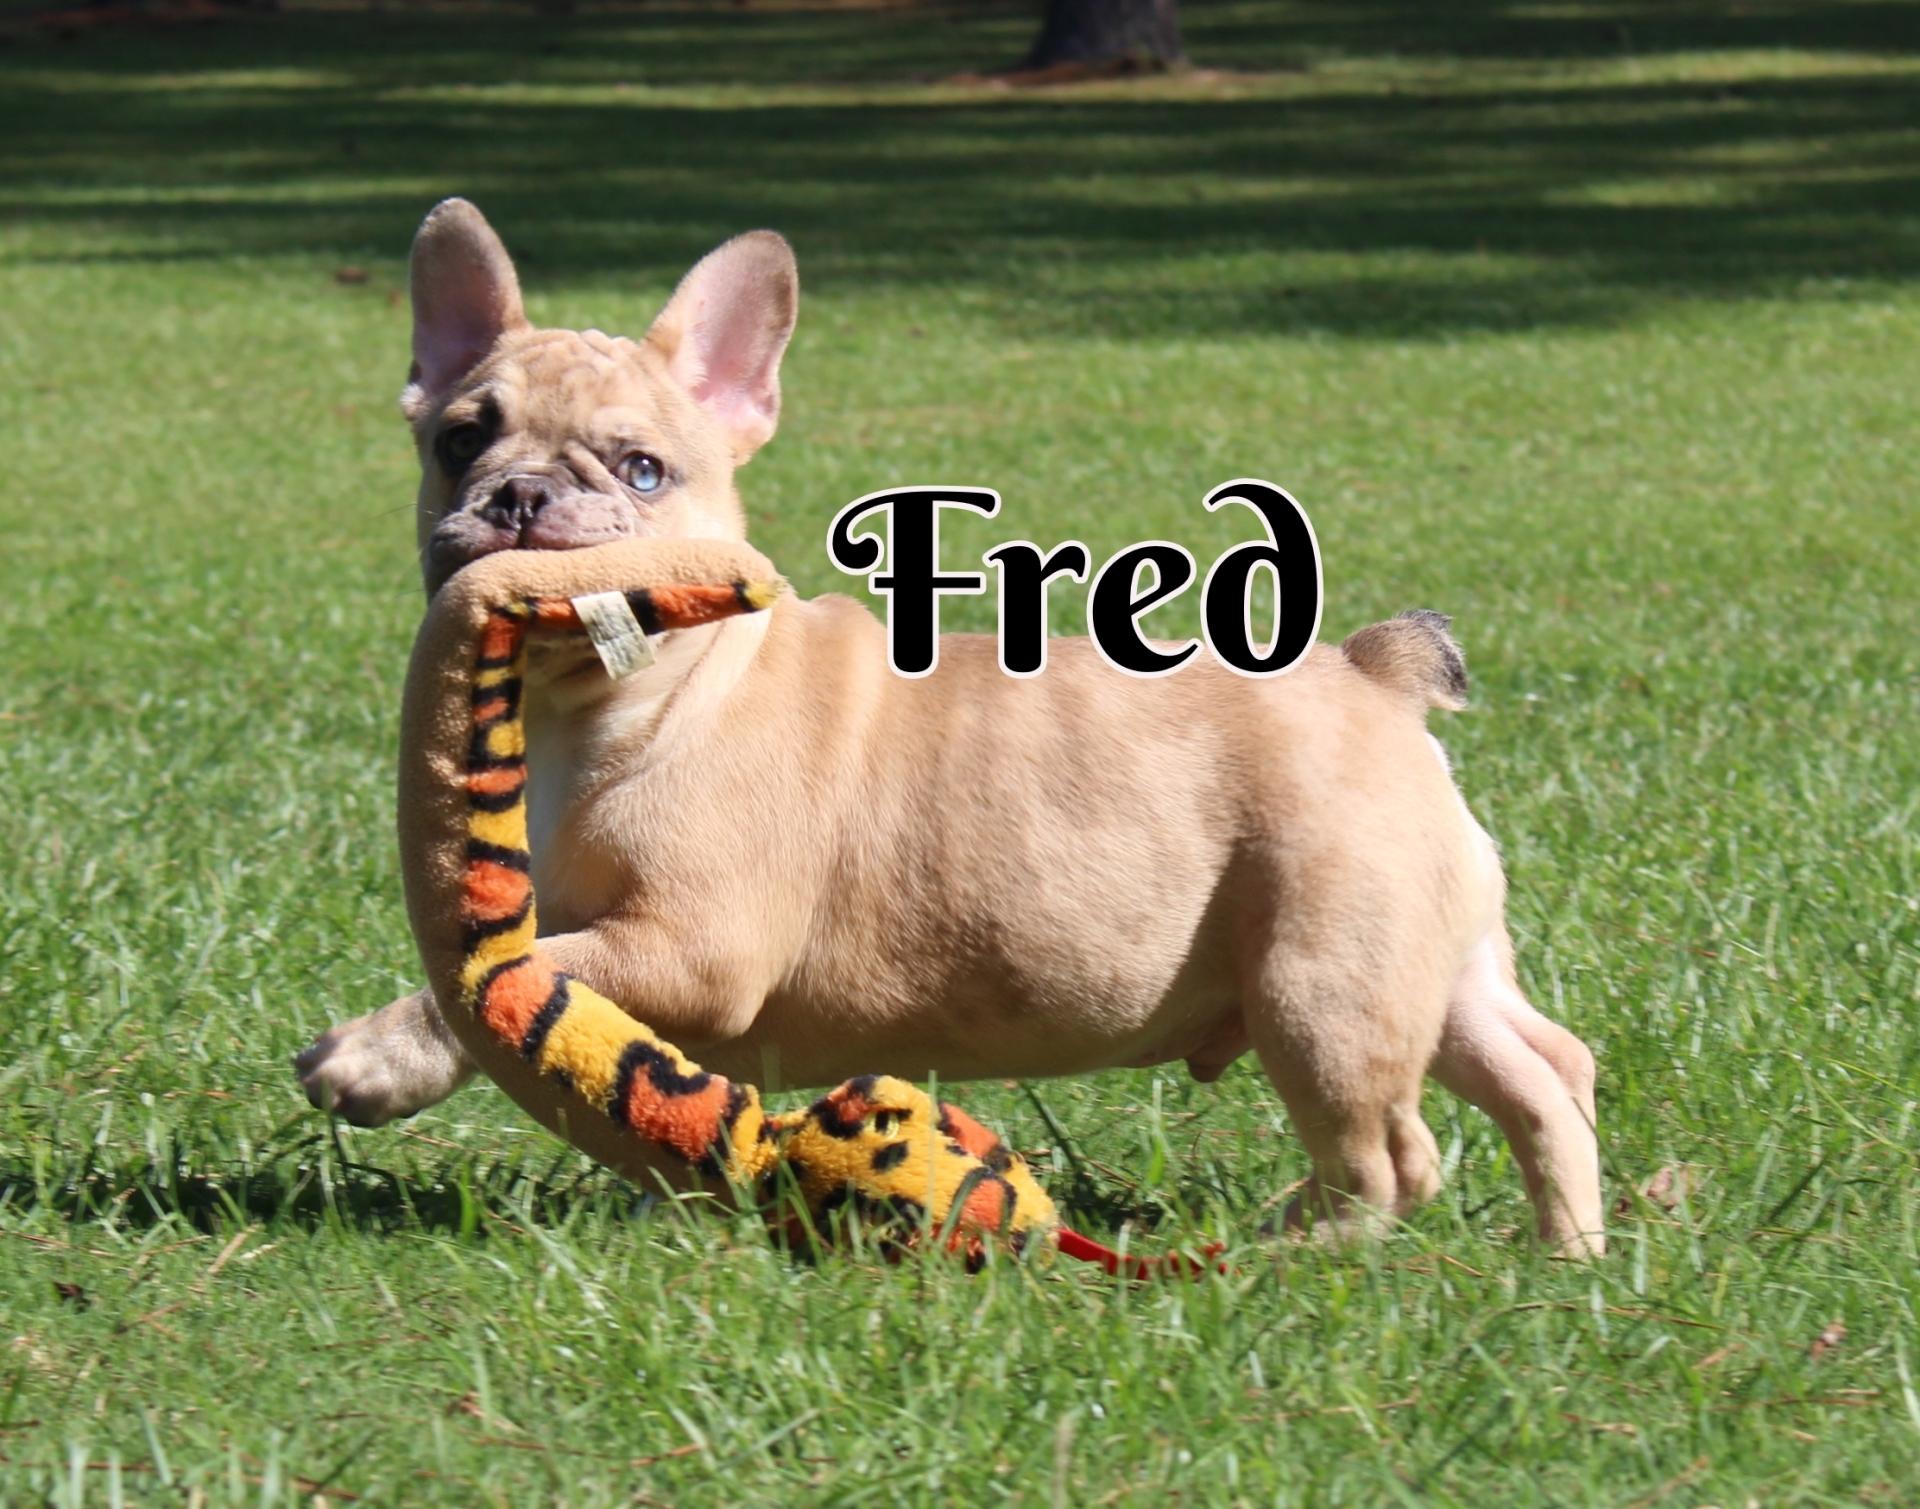 #FrenchBulldogPuppies #MerleFrenchBulldog #Frenchie #AvailablePuppies #AKCRegFrenchBulldog